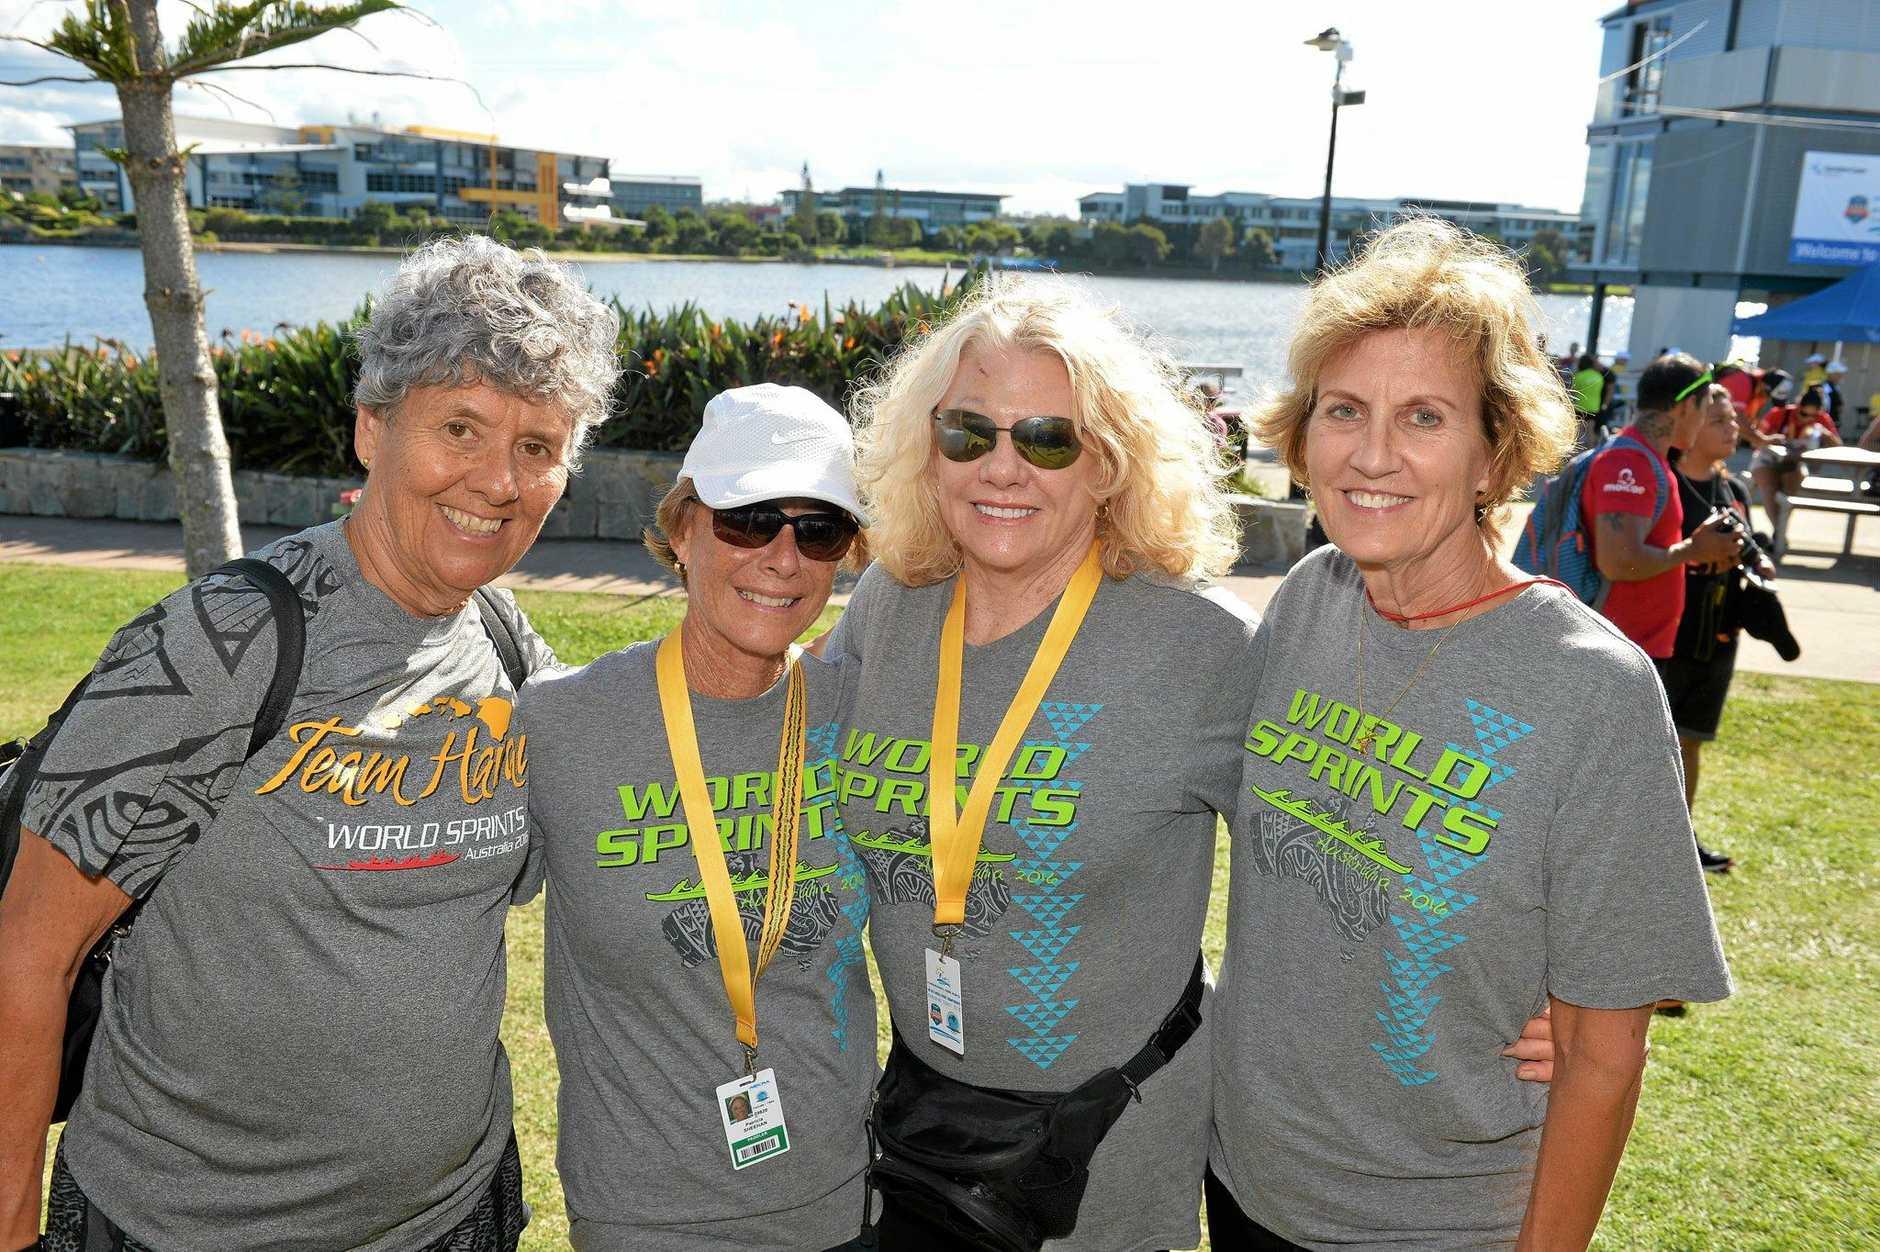 Over 70s crew, Joyce Spoehr, Patsy Sheehan, Barbara Bryan and Joy Nelson.